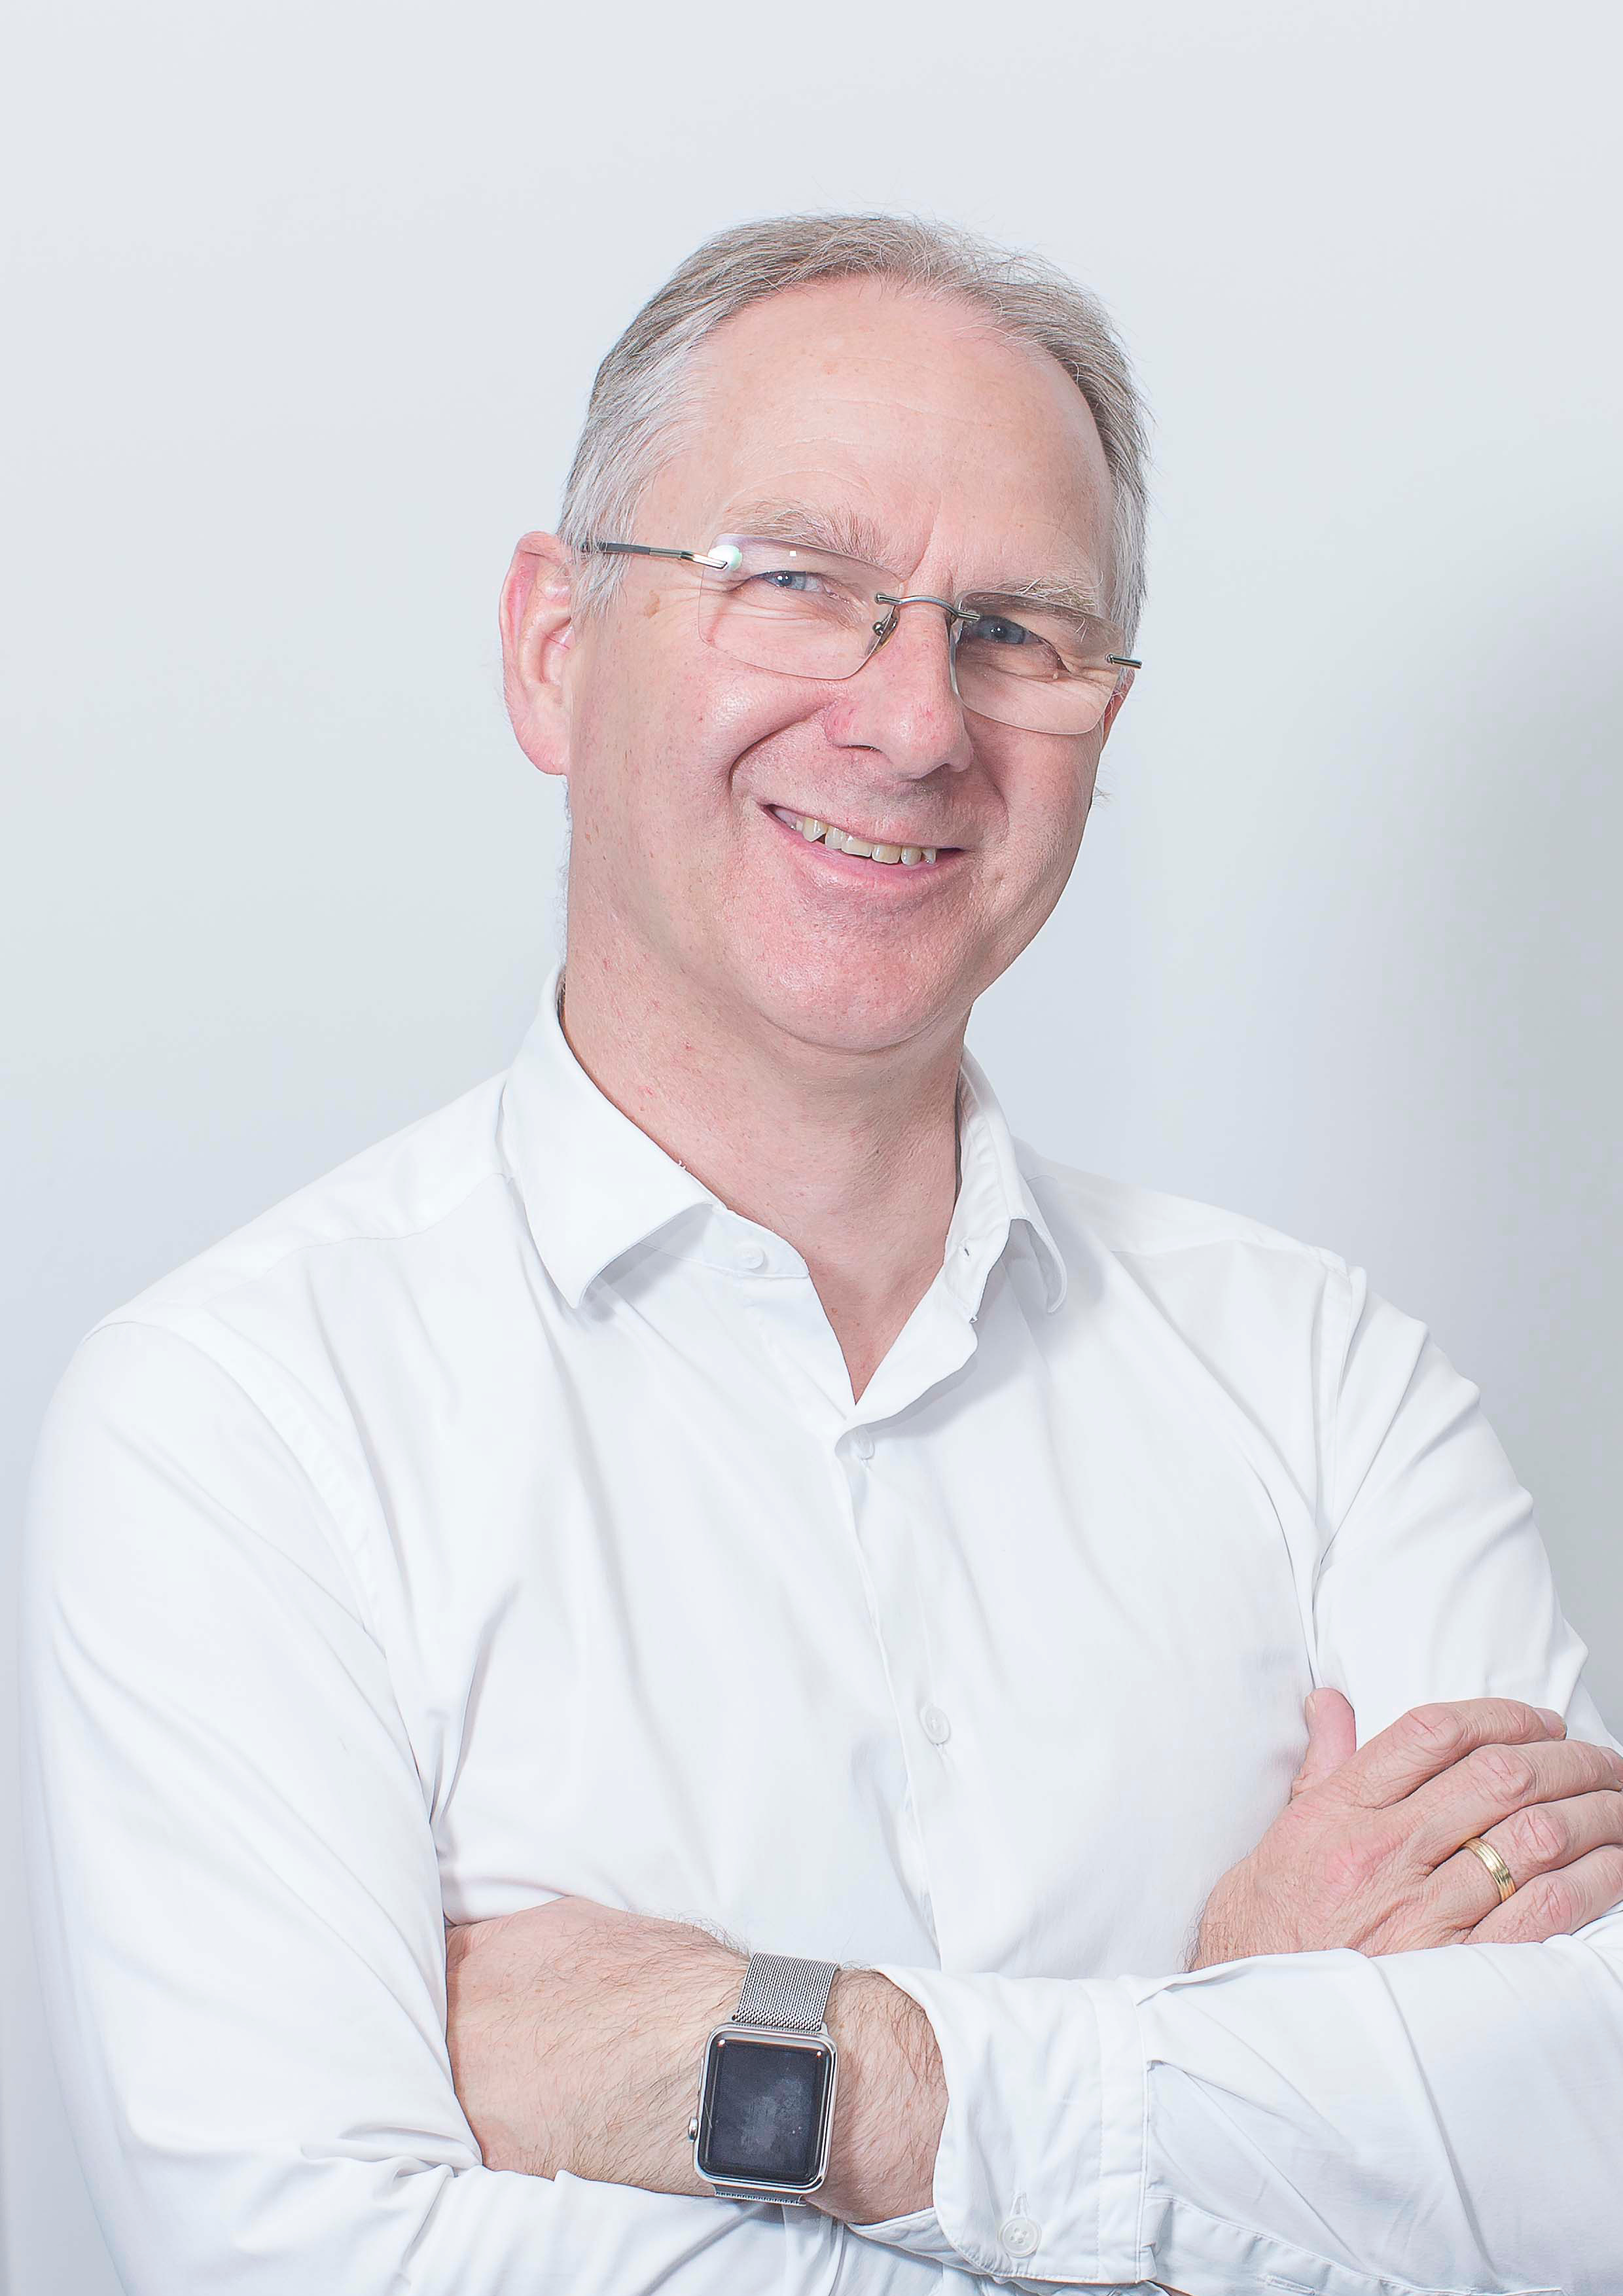 Harald Kopertz